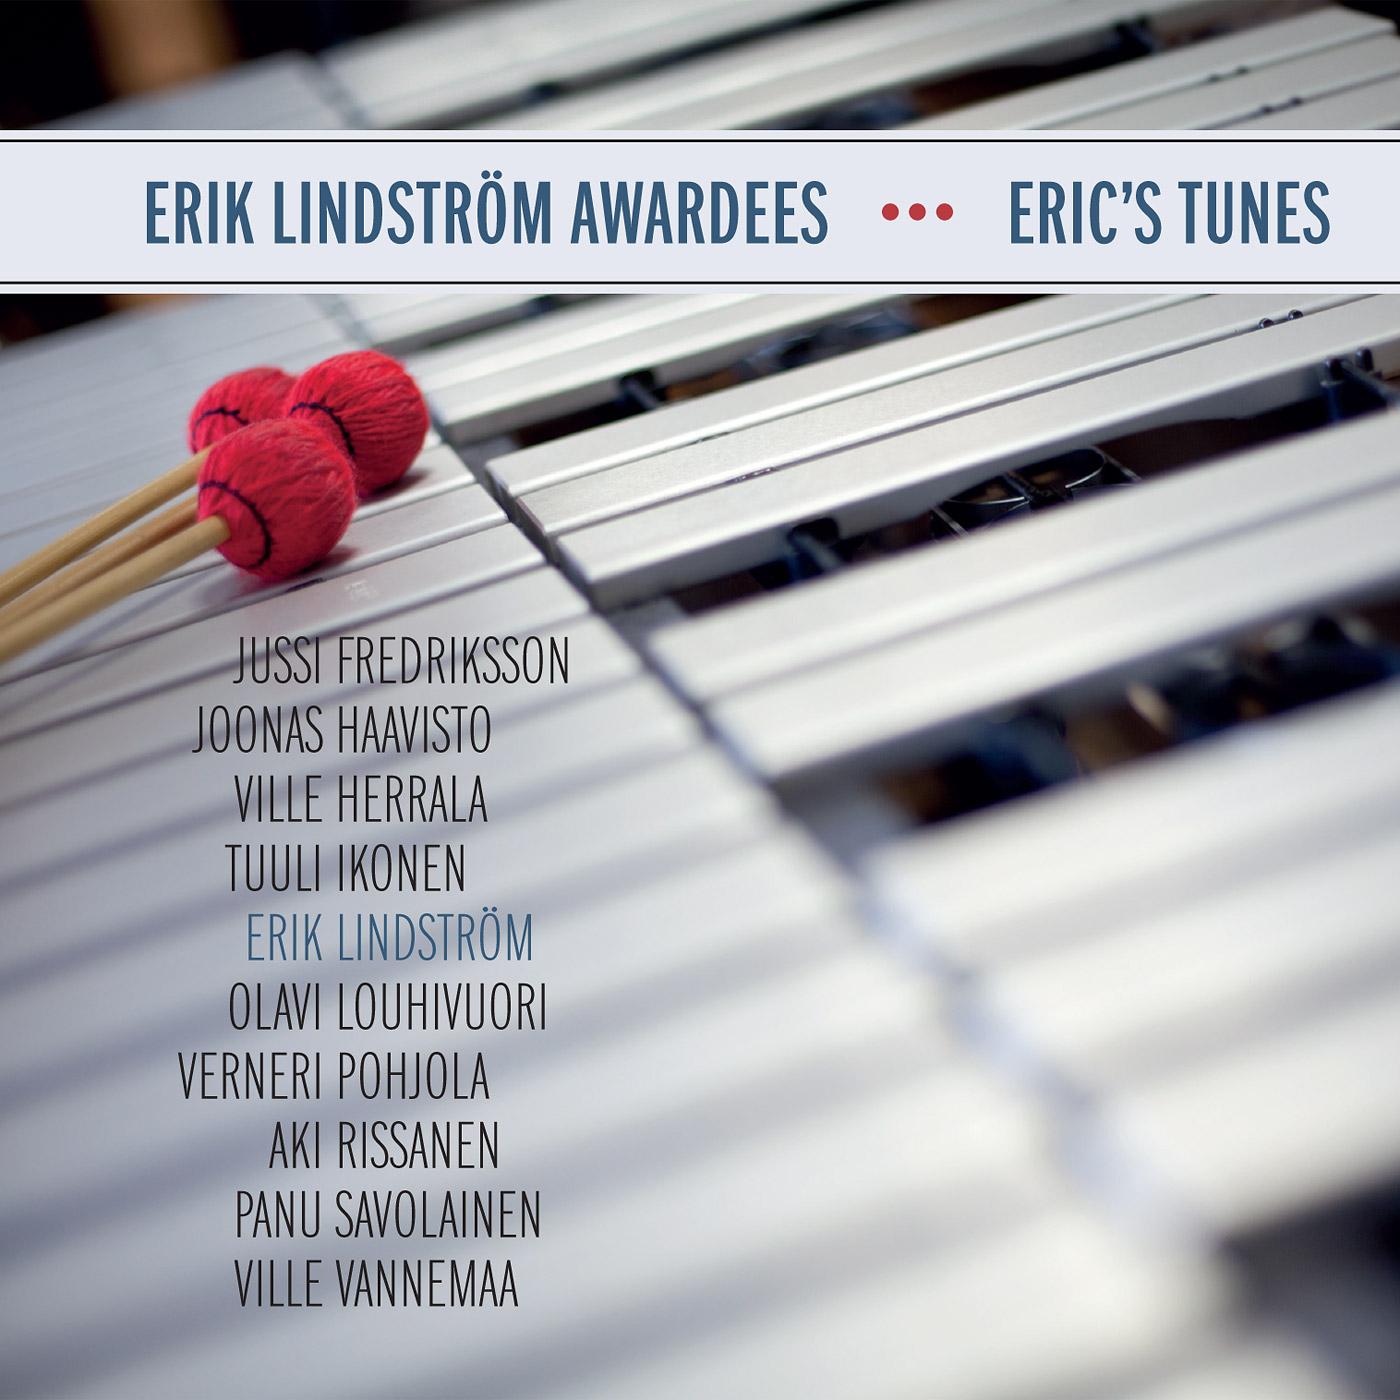 Erik Lindström Awardees: Eric´s Tunes